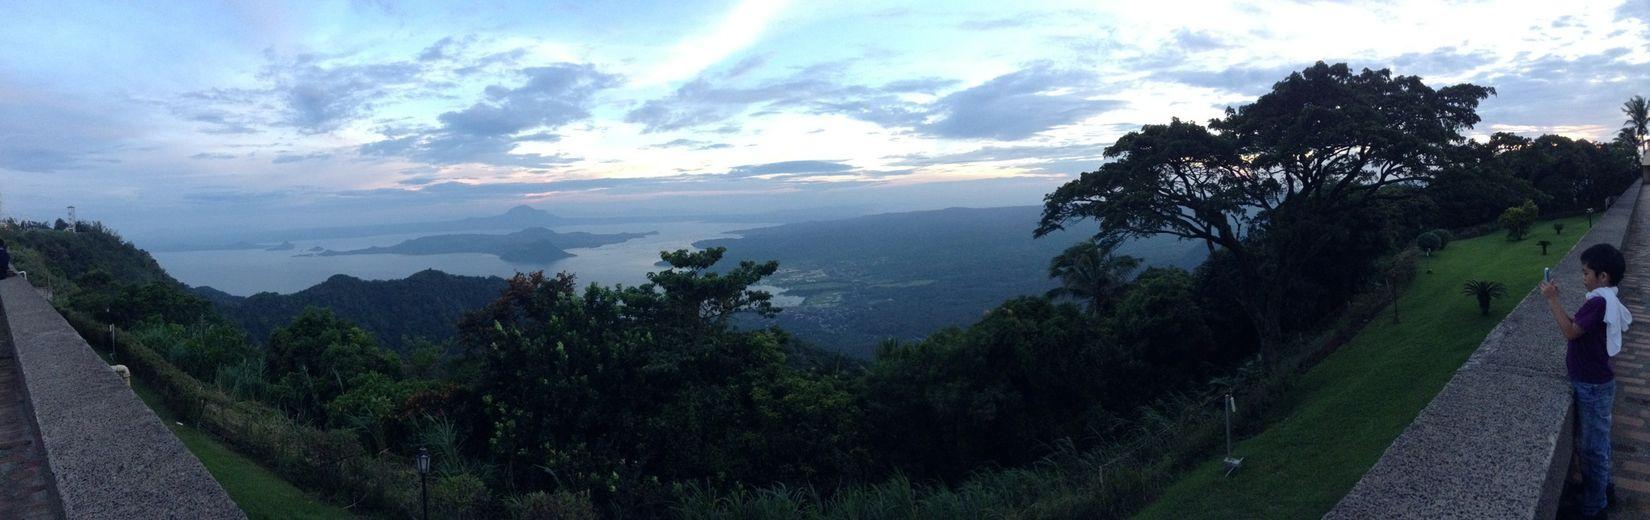 Tagaytay, Philippines No Filter No Edit/no Filter Chilling Vacation